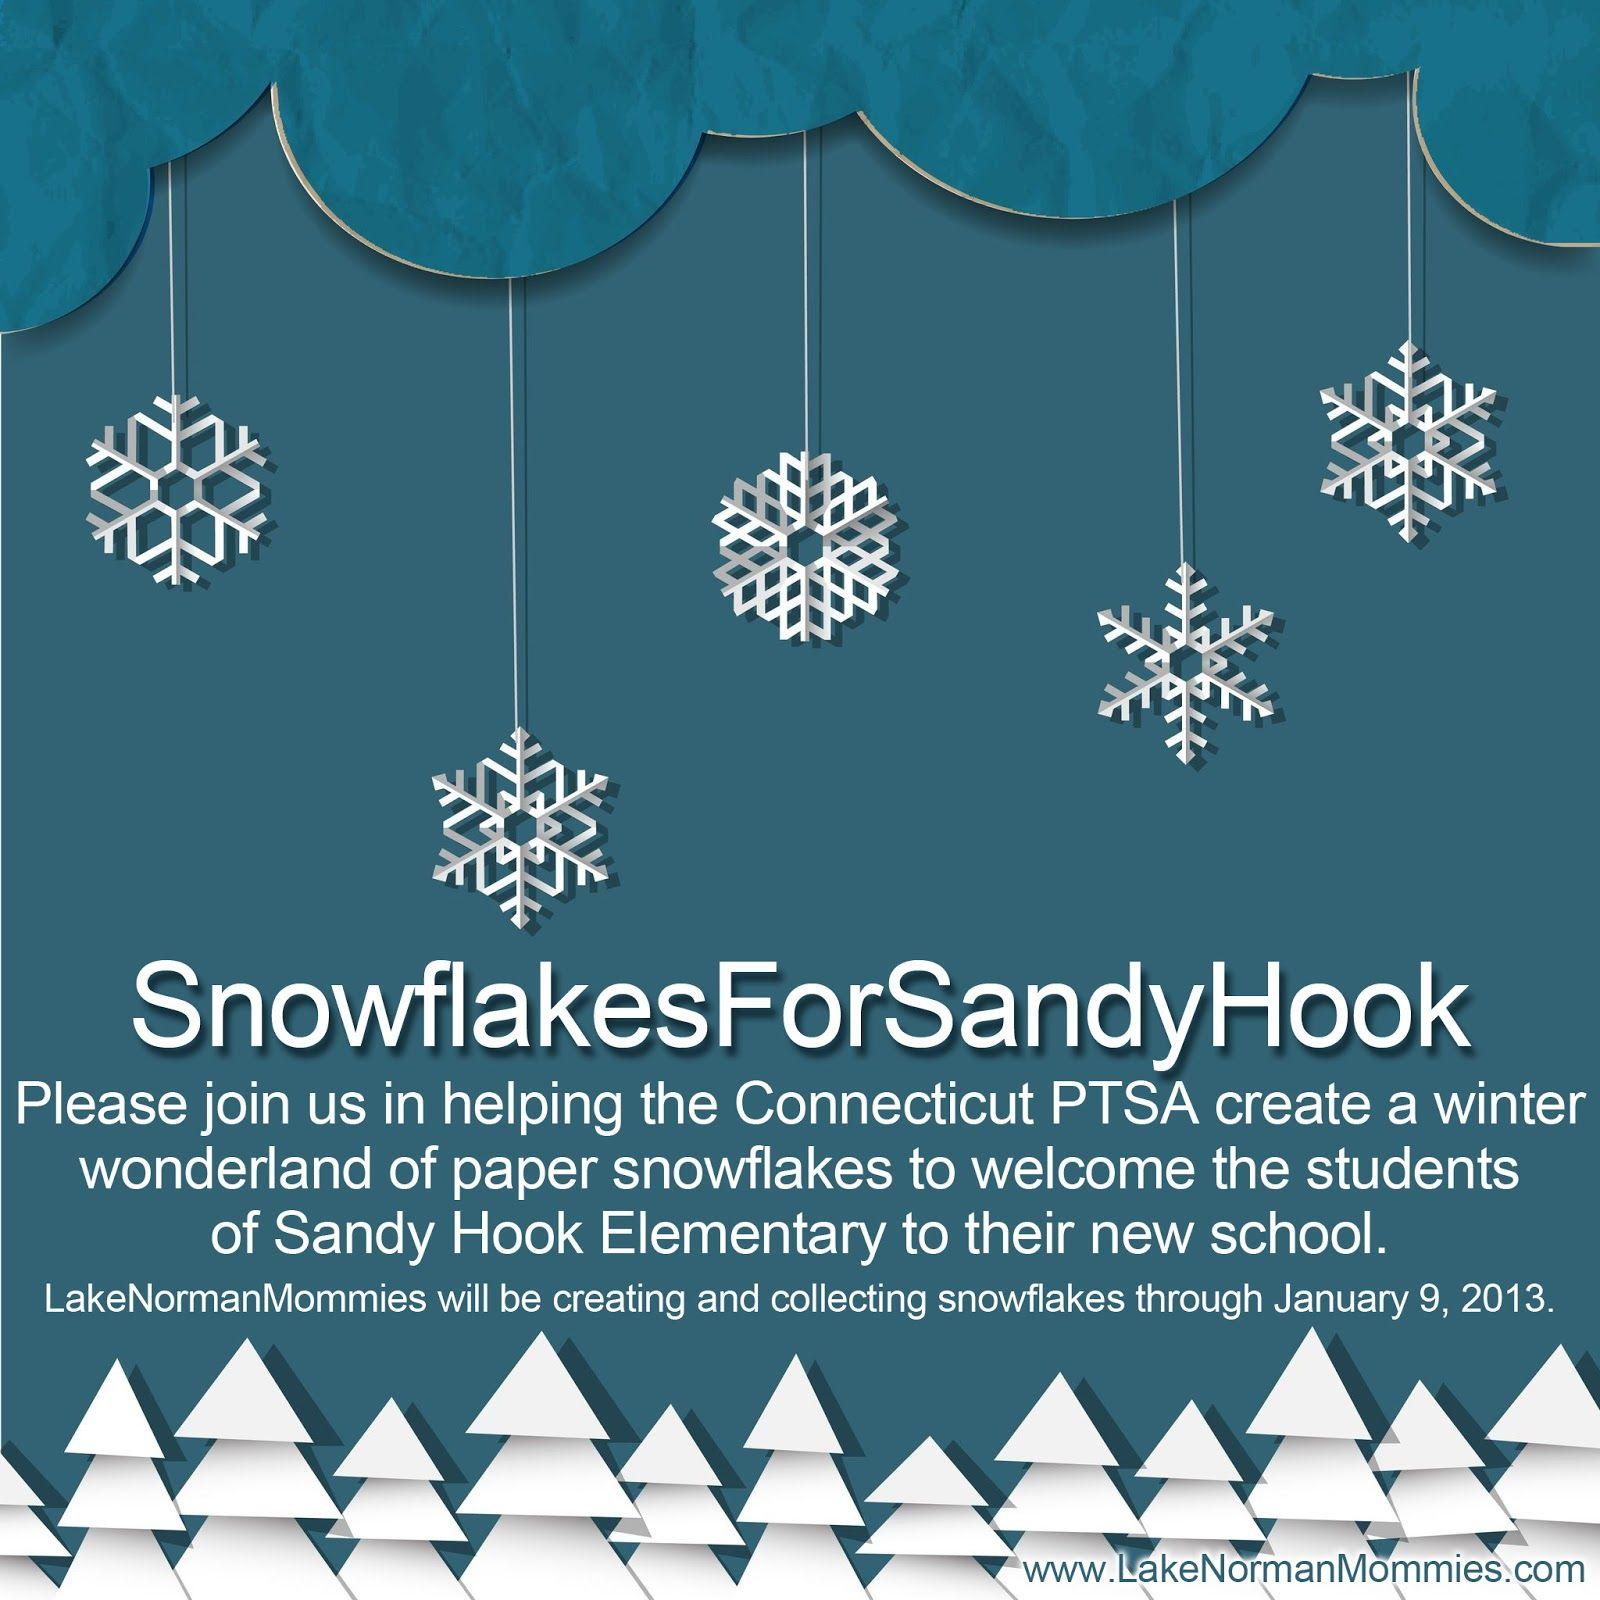 #SnowflakesForSandyHook